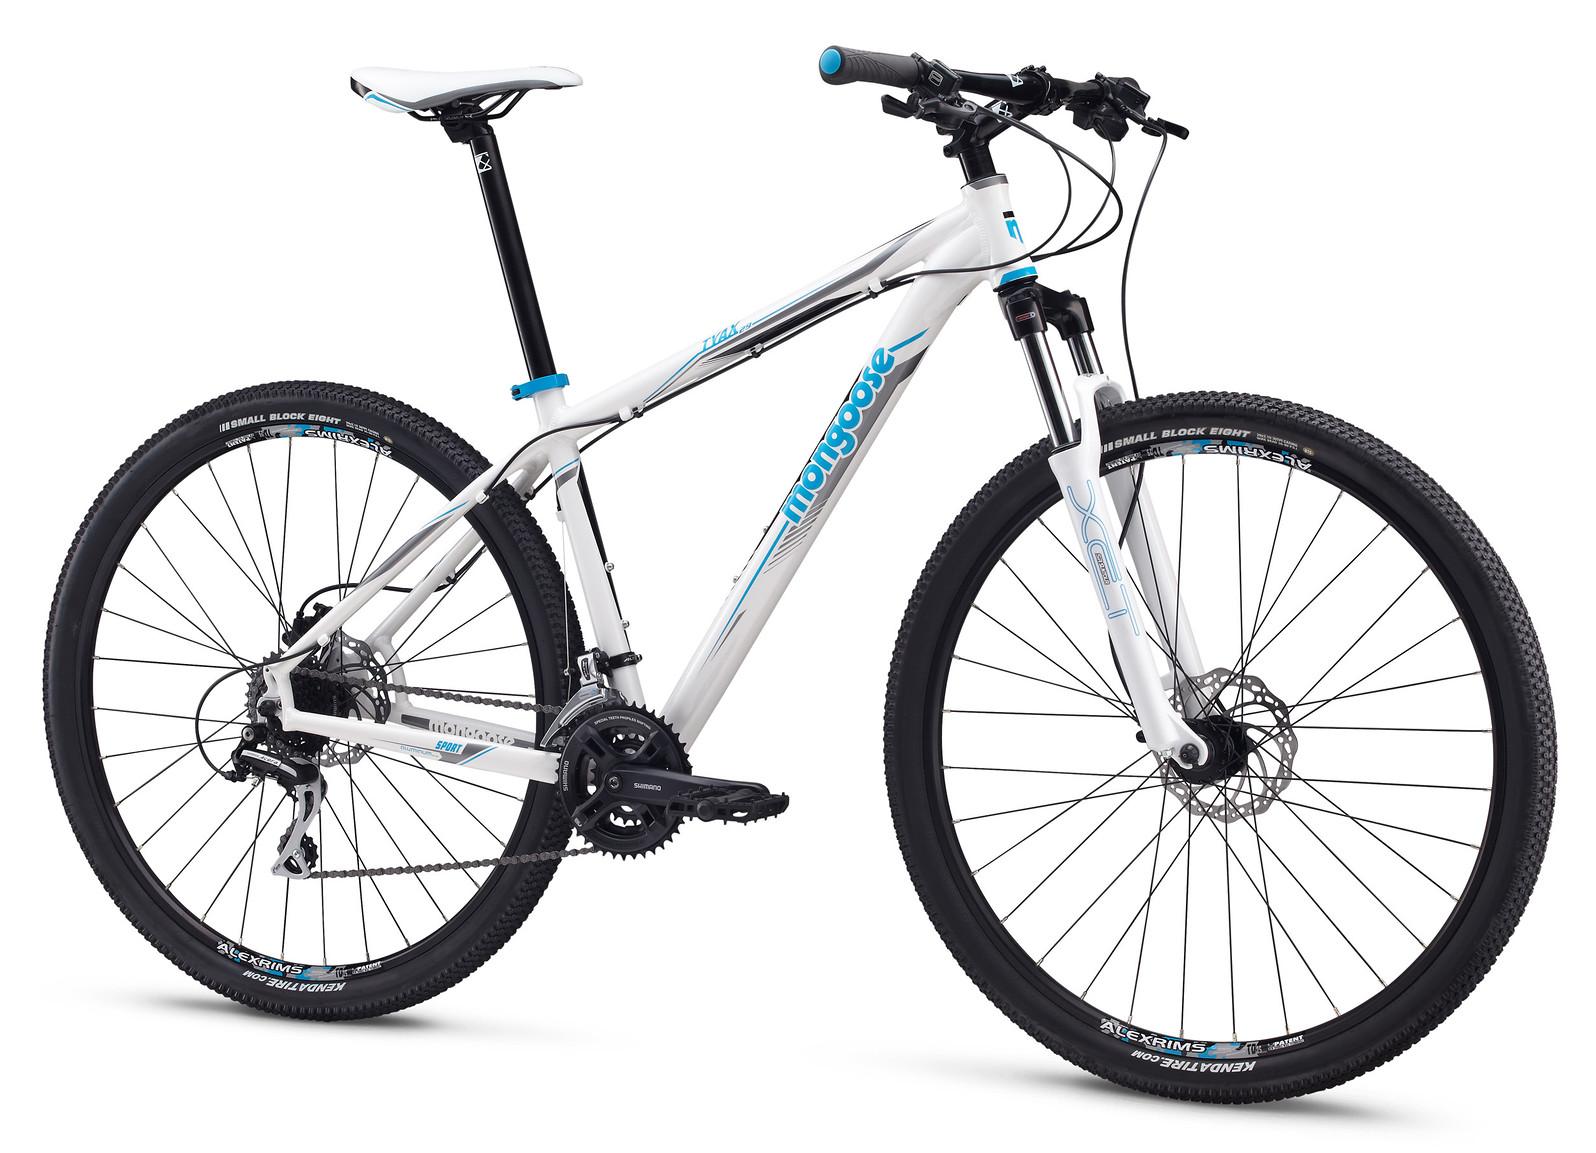 2014 Mongoose Tyax Sport 29 Bike